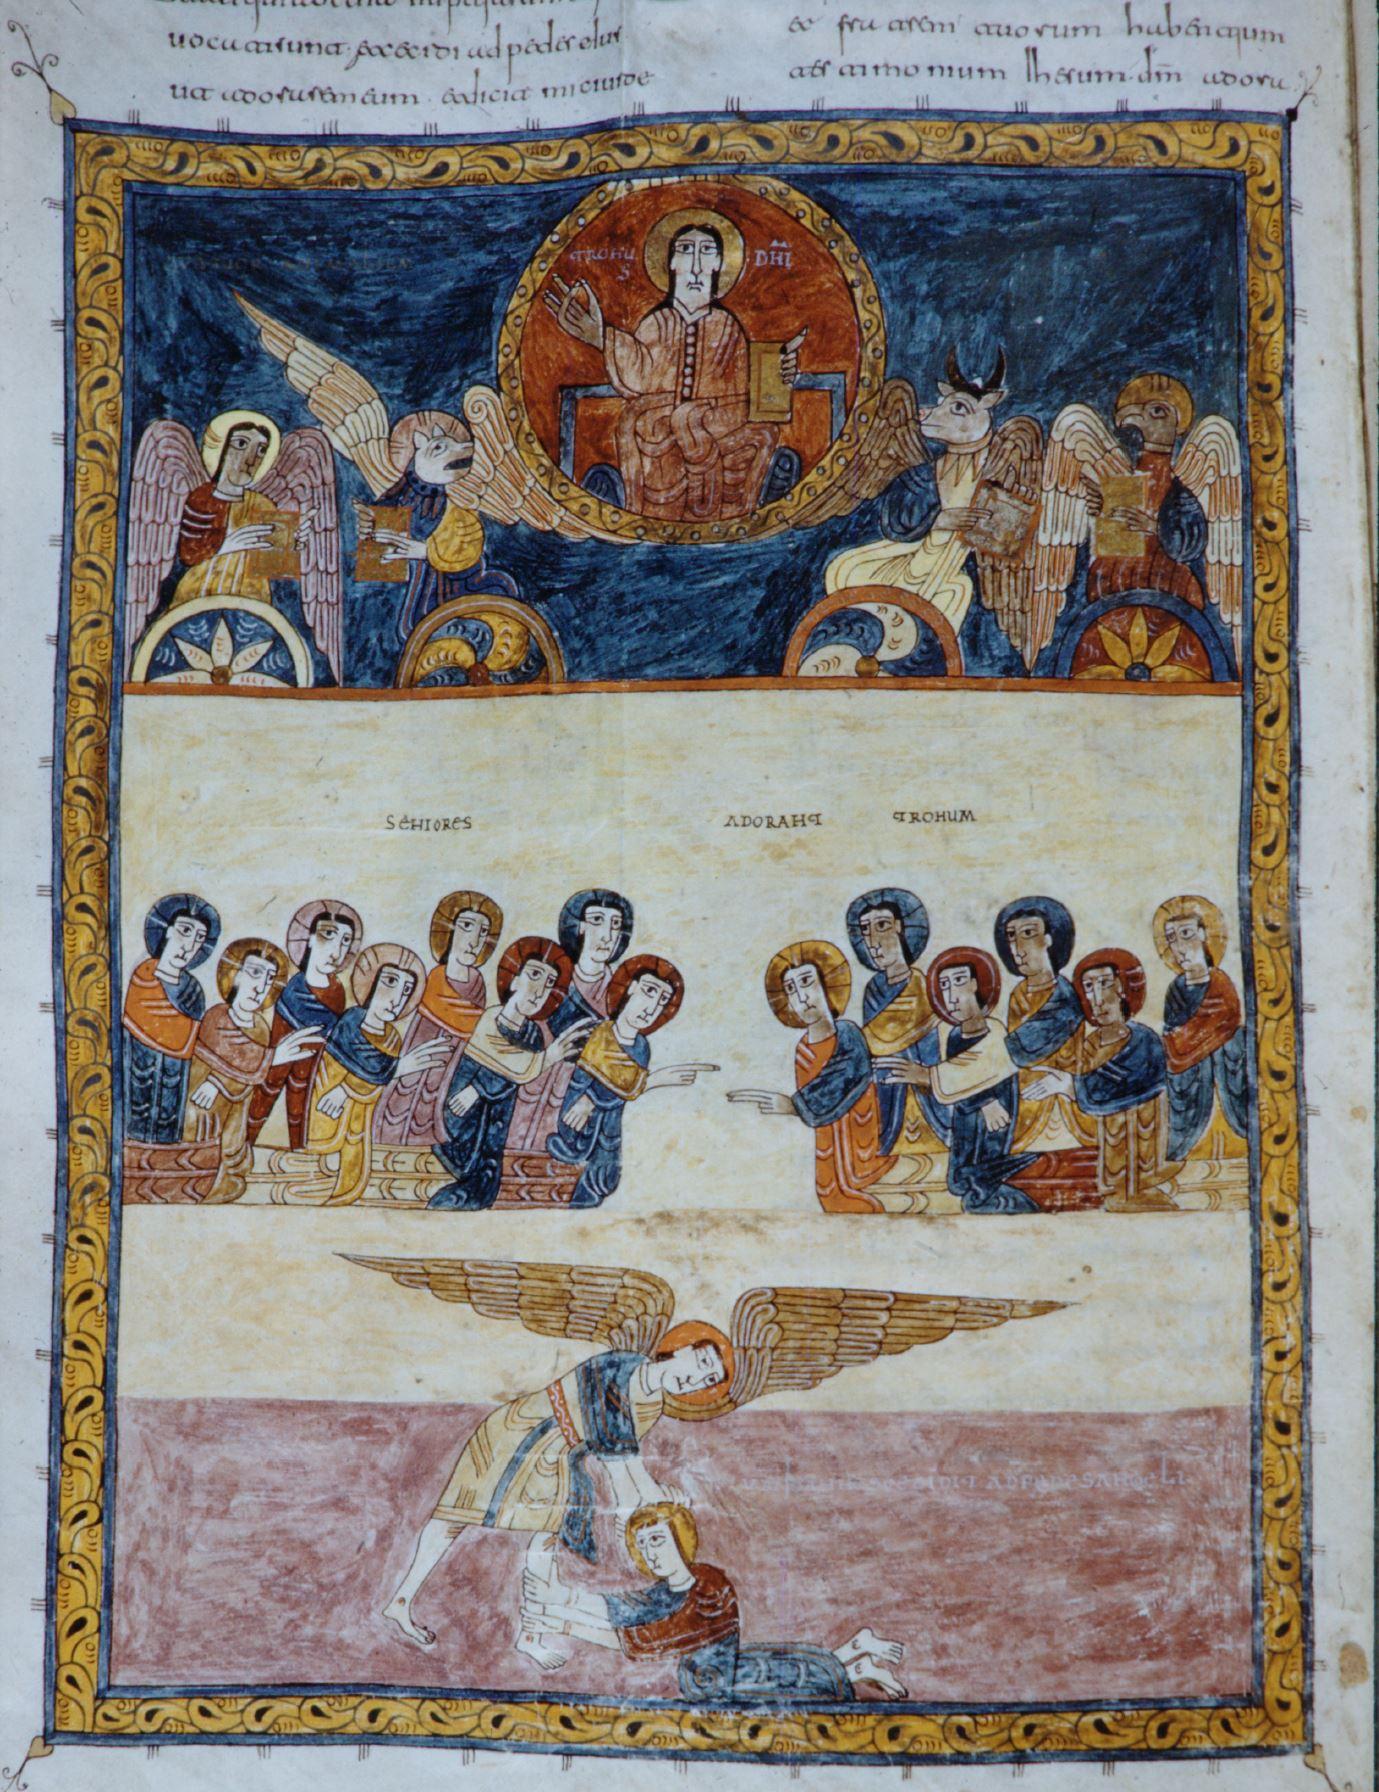 Beatus de gerone 975 Apocalypse 19,1